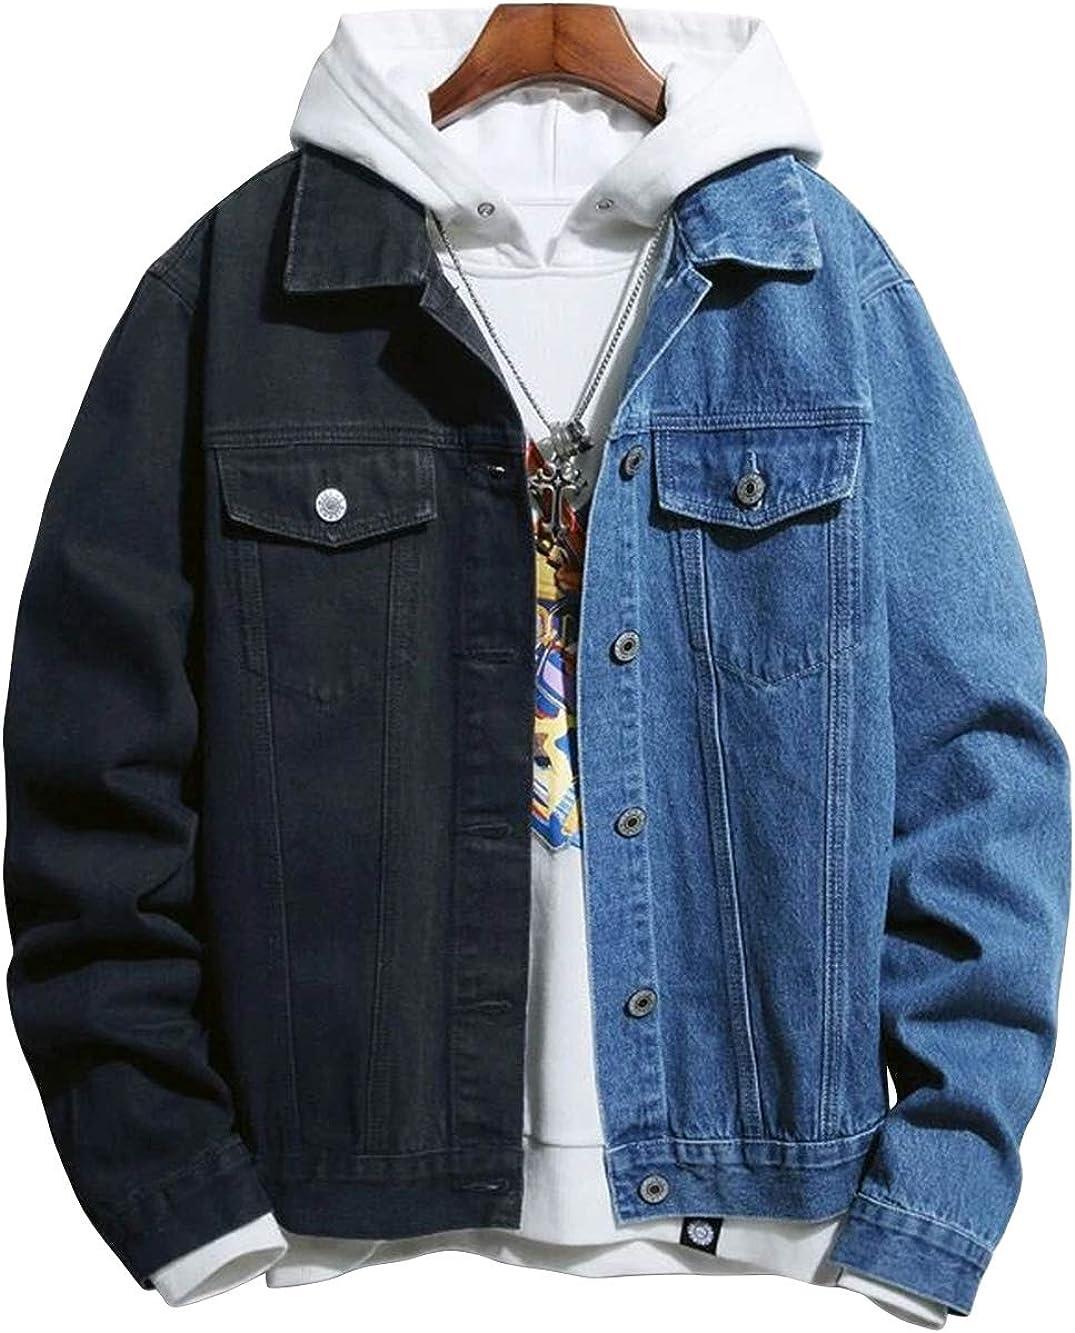 chouyatou Men's Loose-Fit Stylish Contrast Color Spliced Spring Denim Trucker Jacket